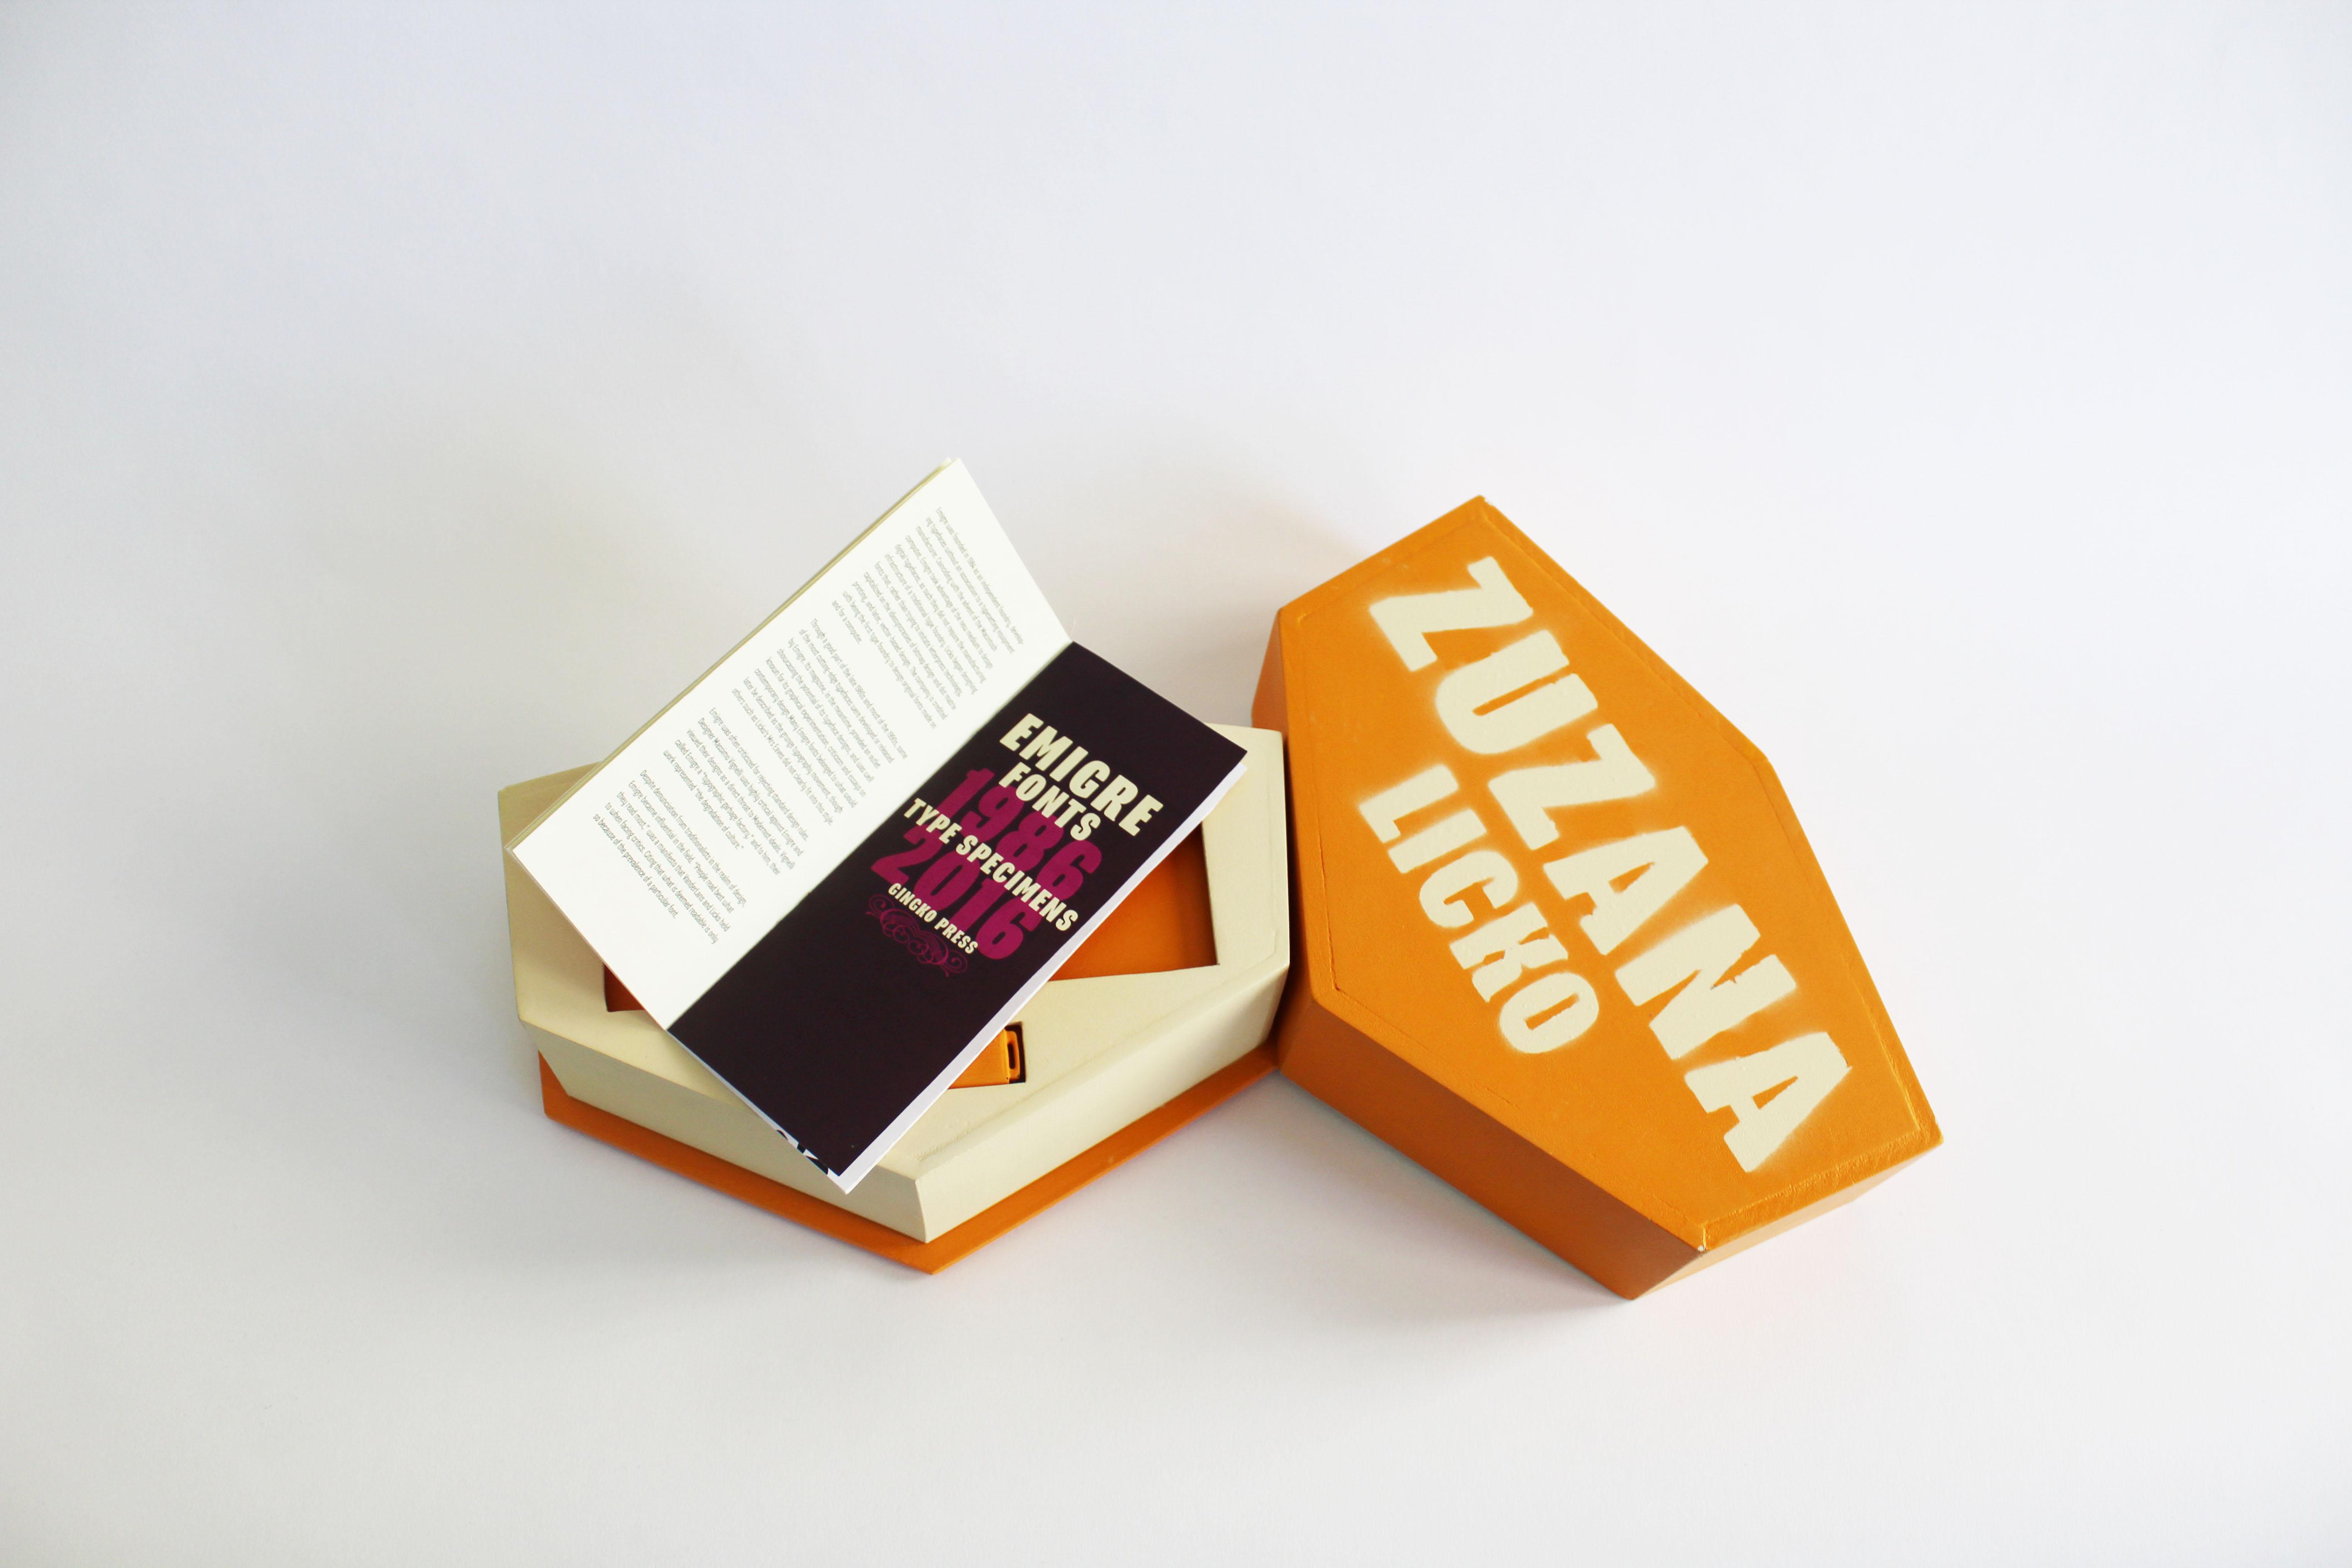 3D box book spreads